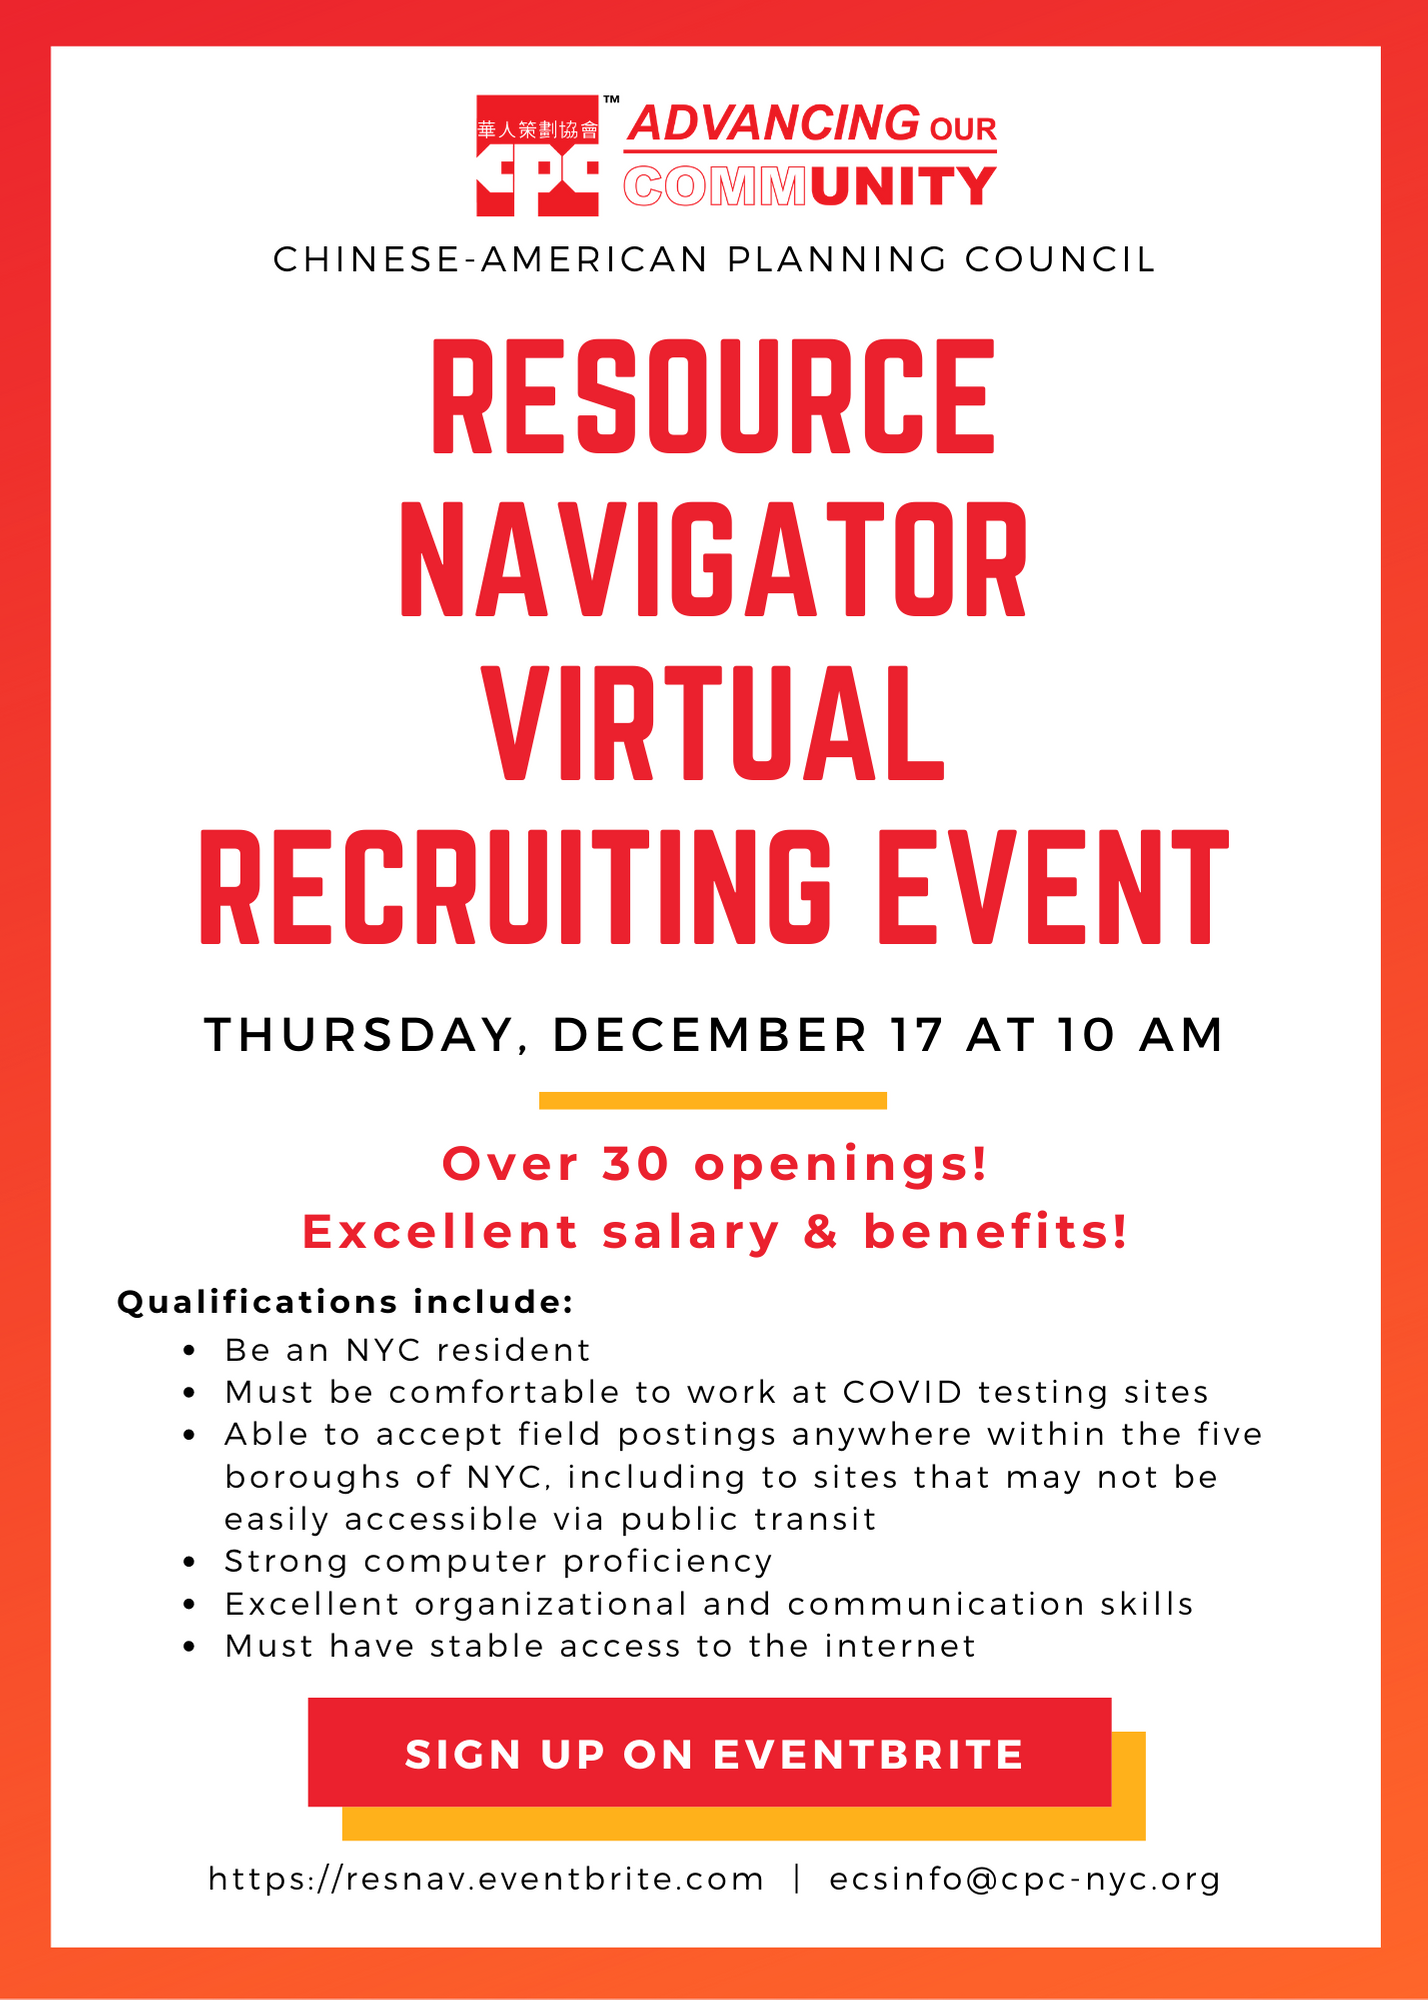 Resource Navigator Virtual Recruiting Event Thursday, December 17th at 10am